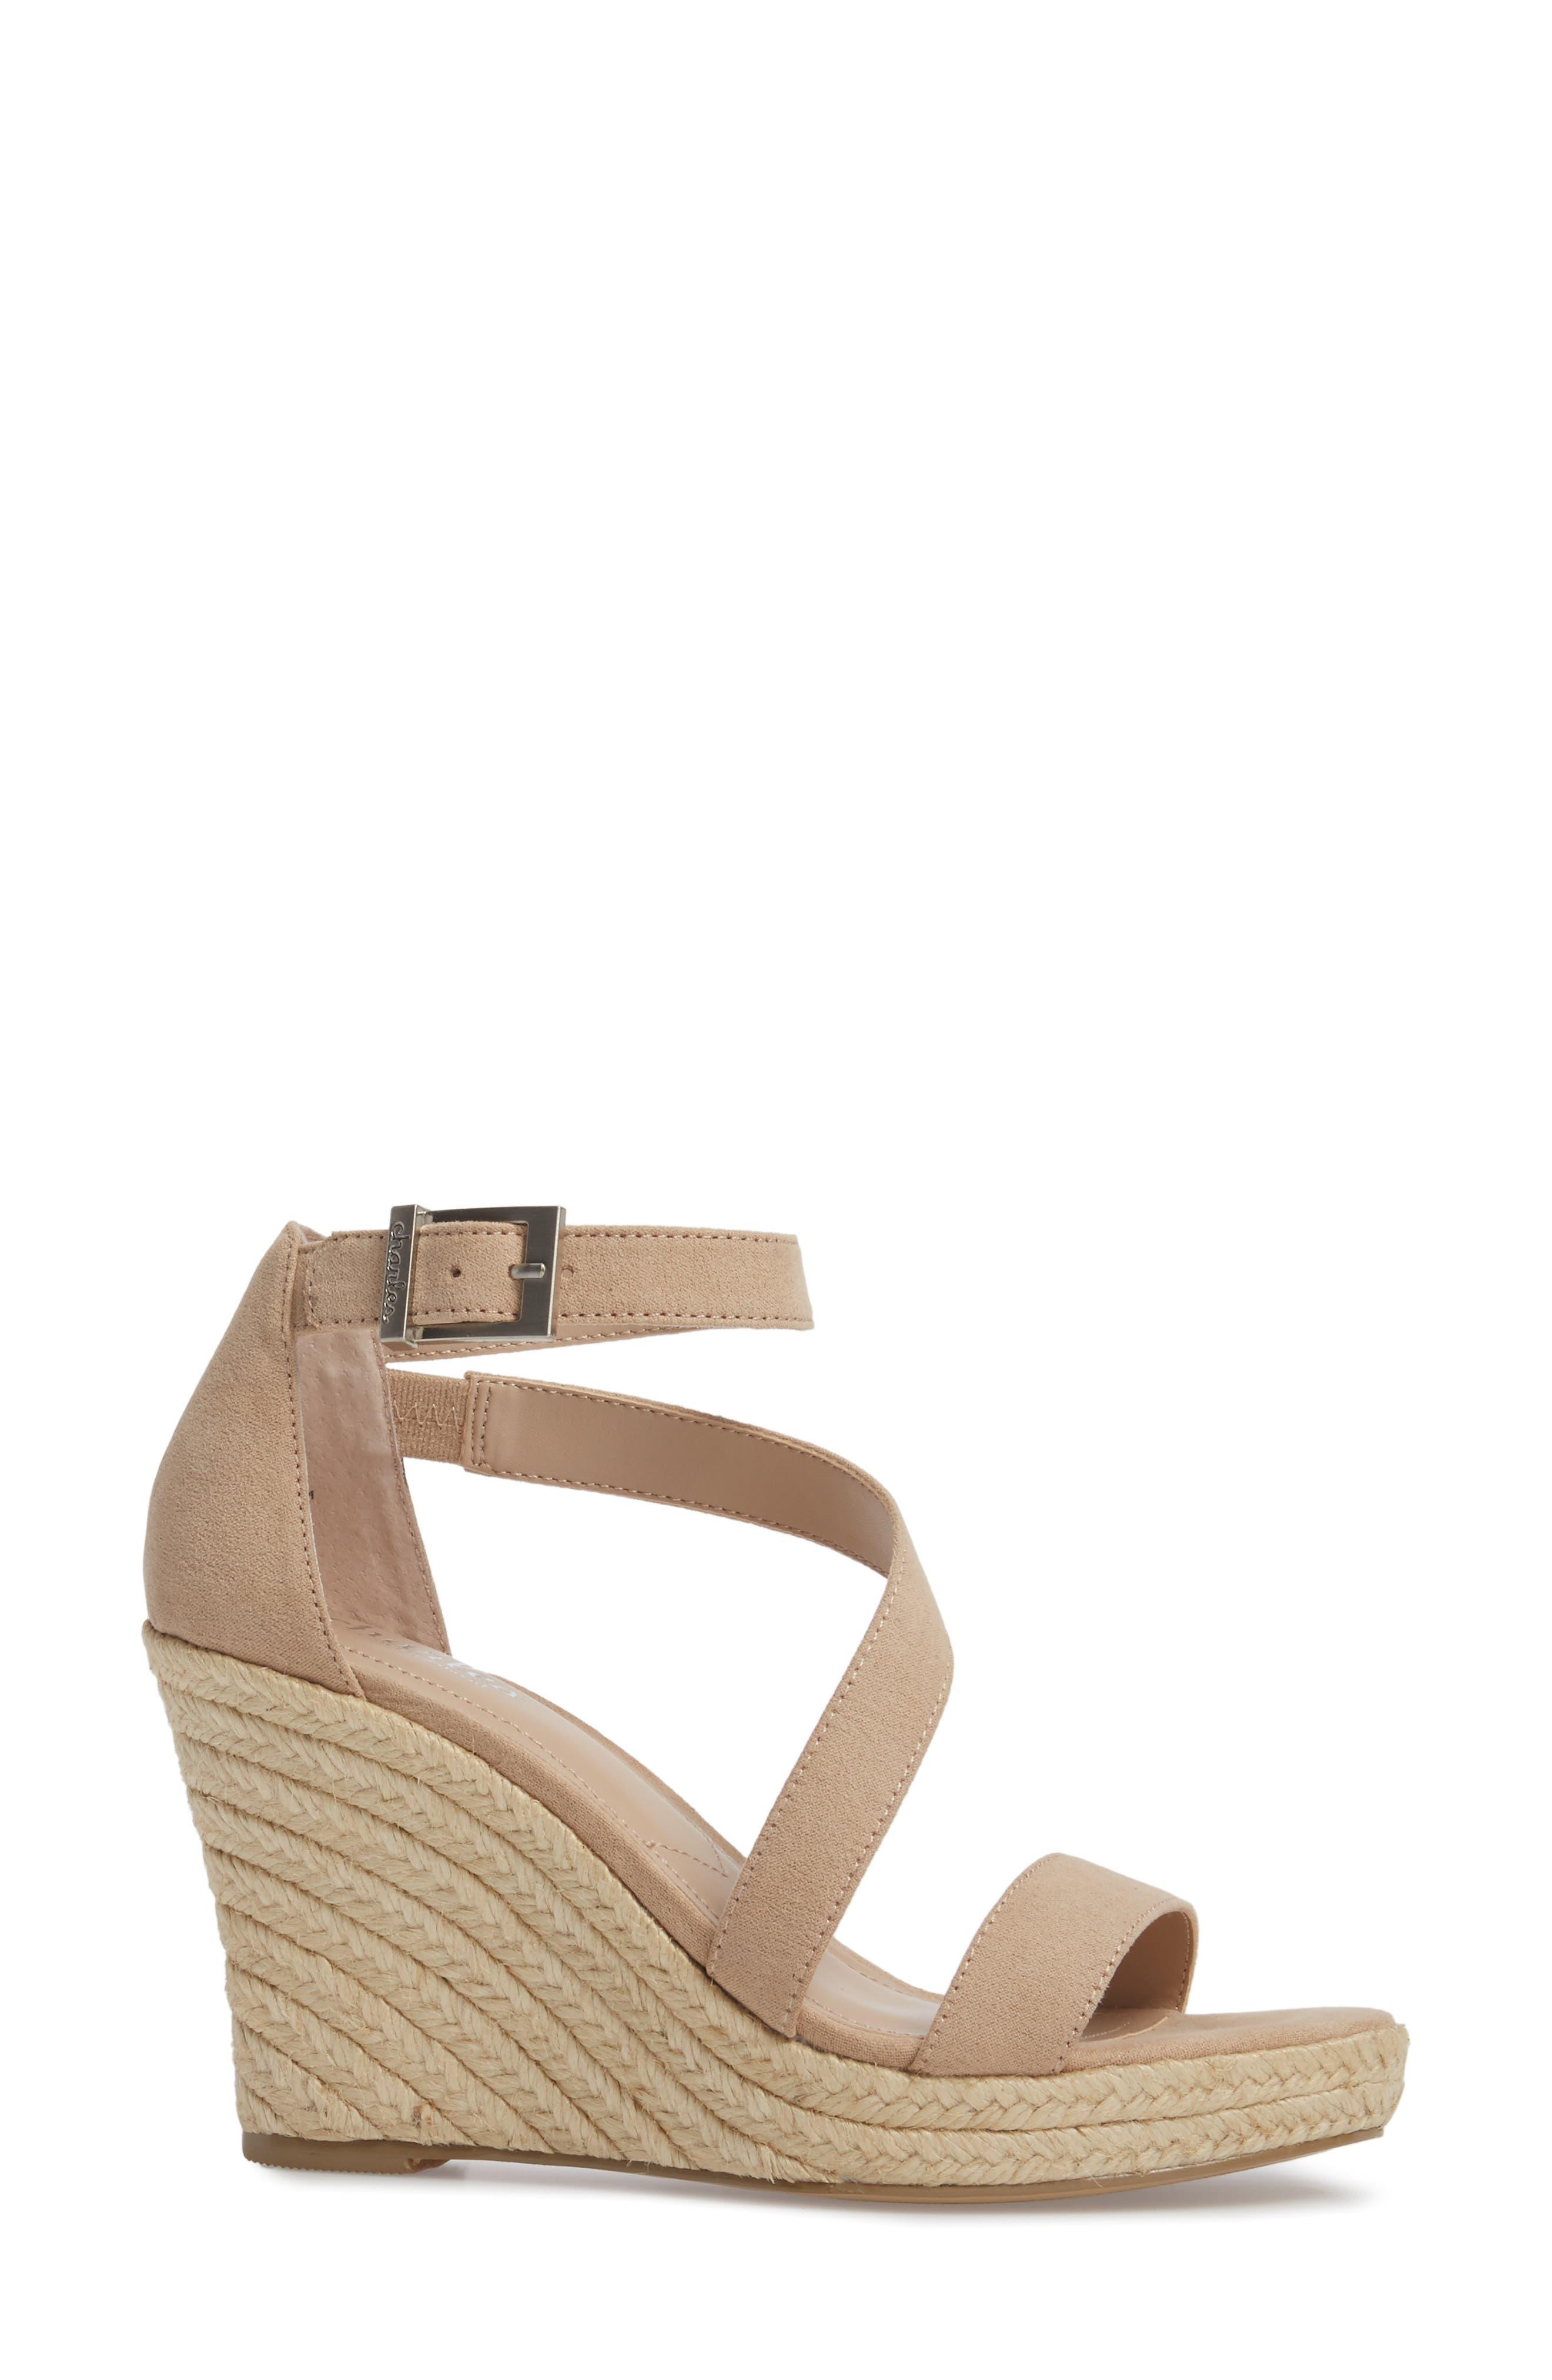 Lou Asymmetrical Wedge Sandal,                             Alternate thumbnail 3, color,                             Nude Suede